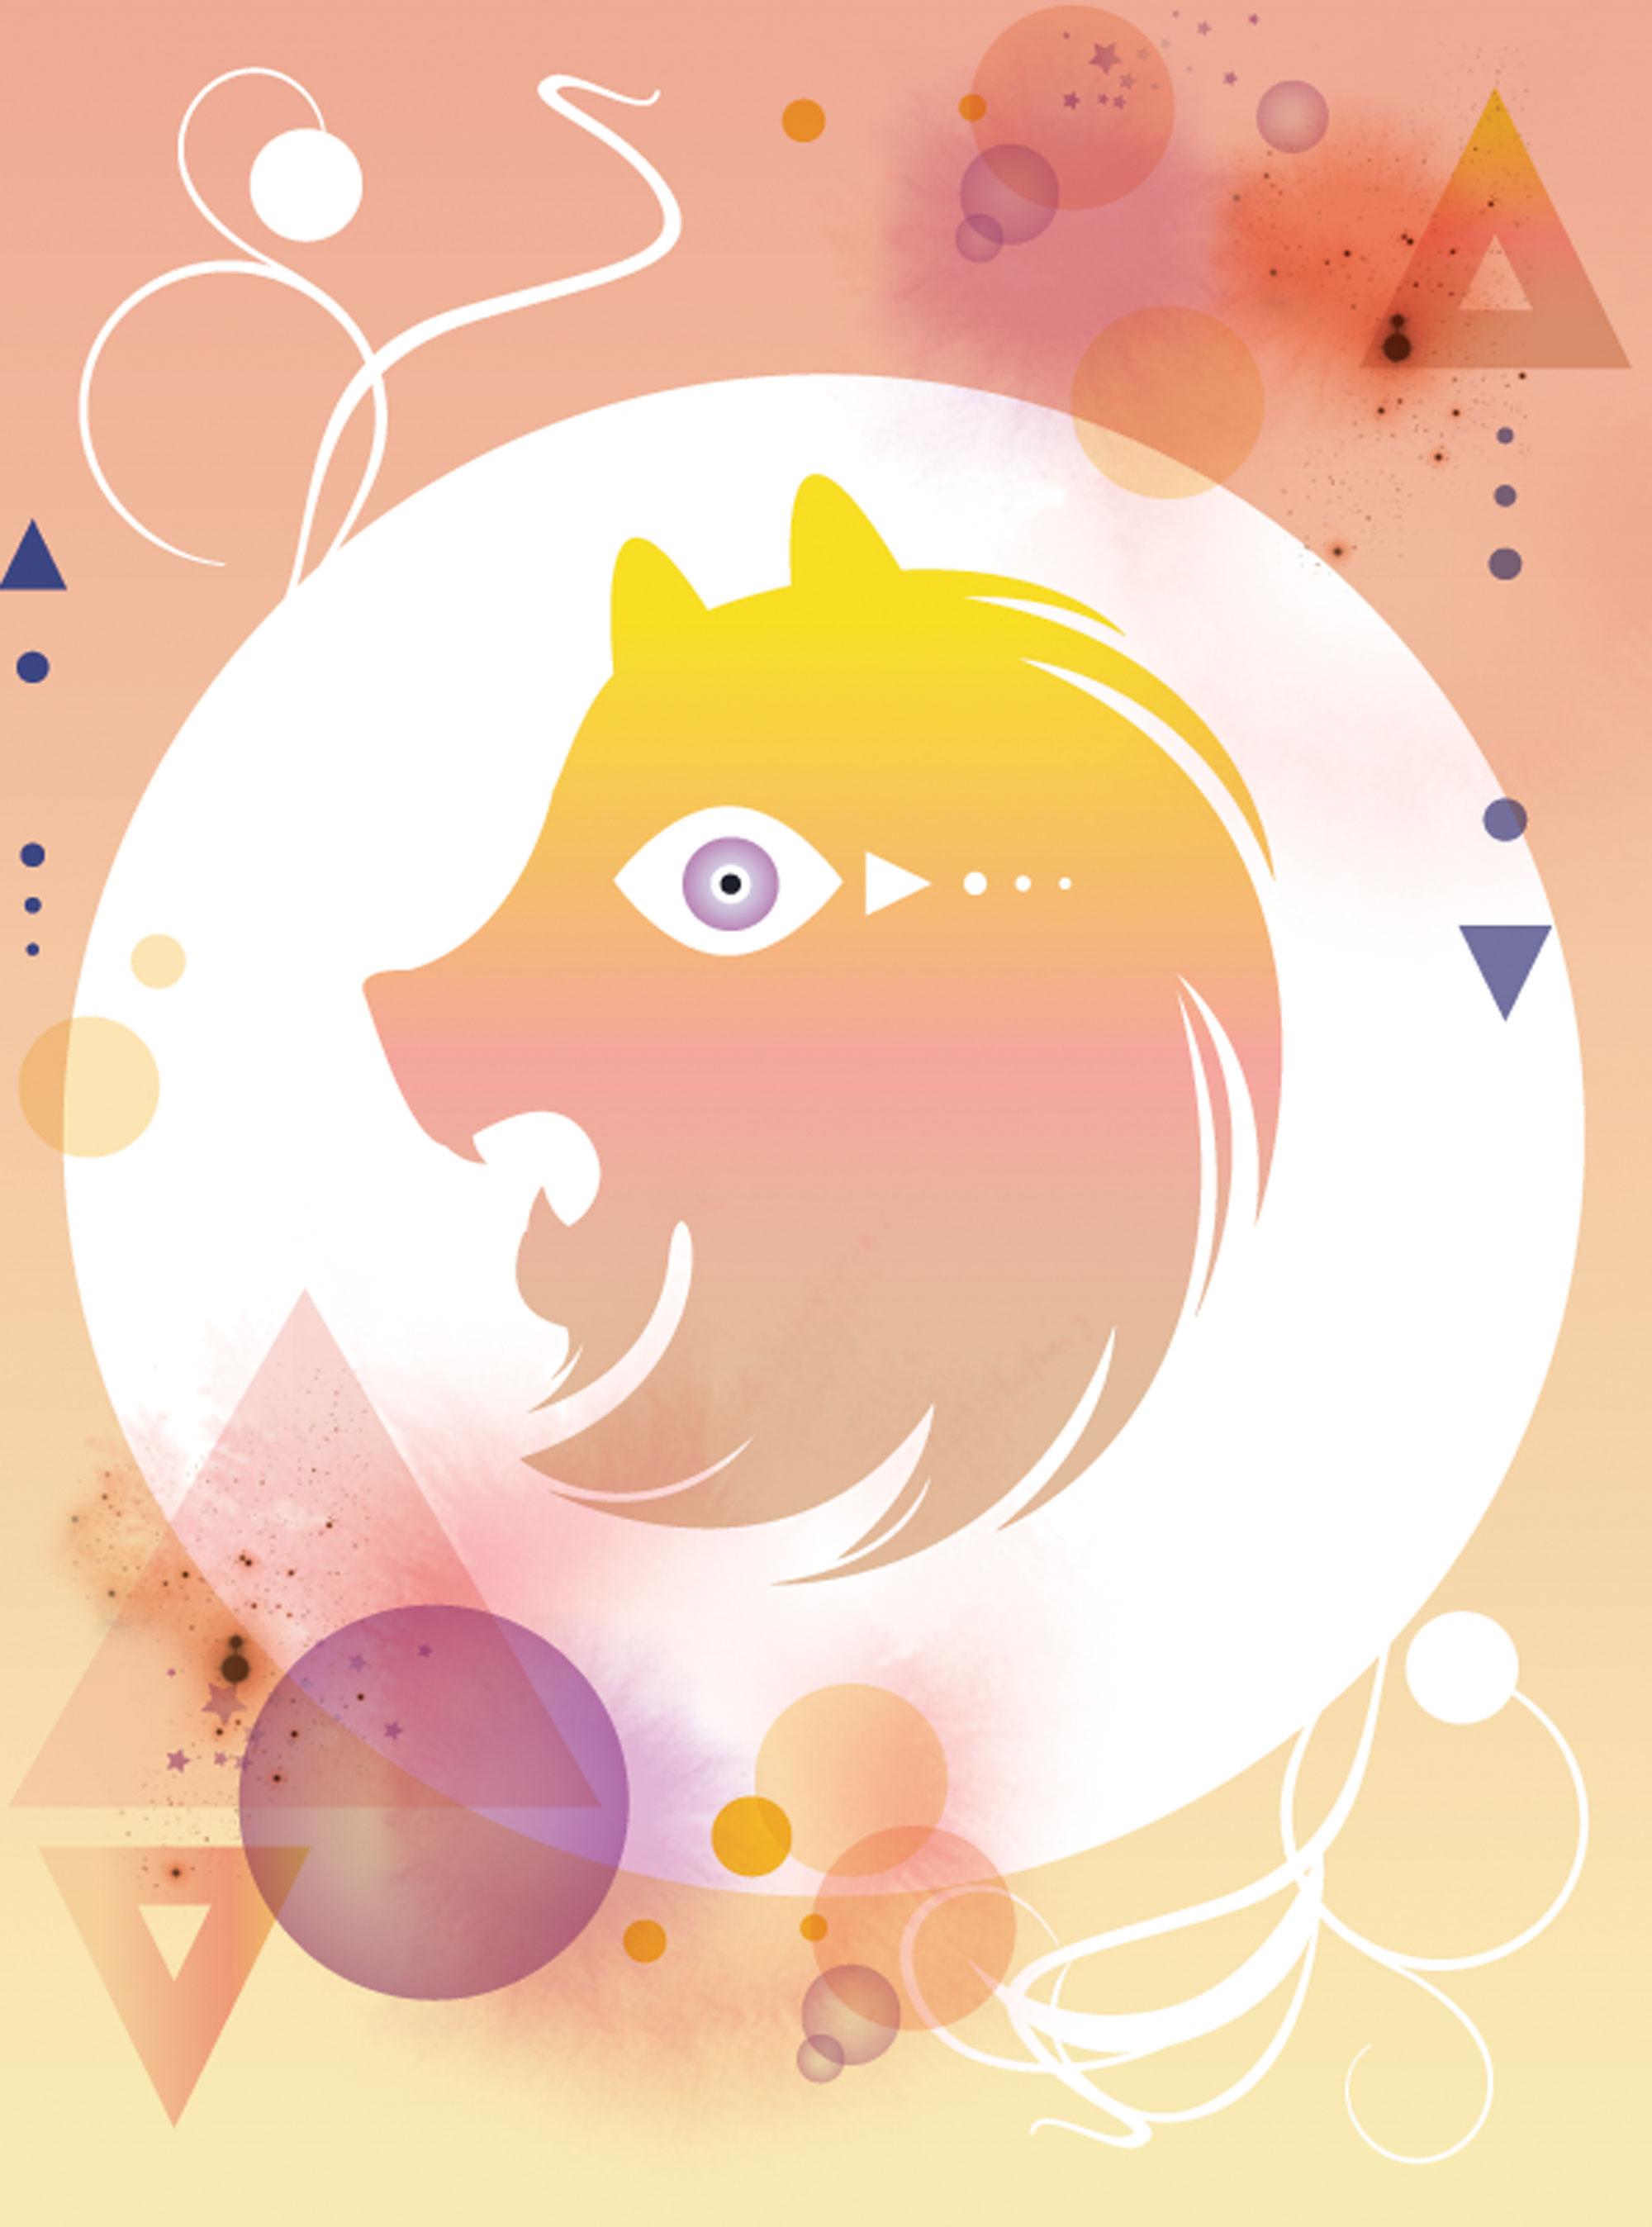 Weekly Horoscope: Leo star sign